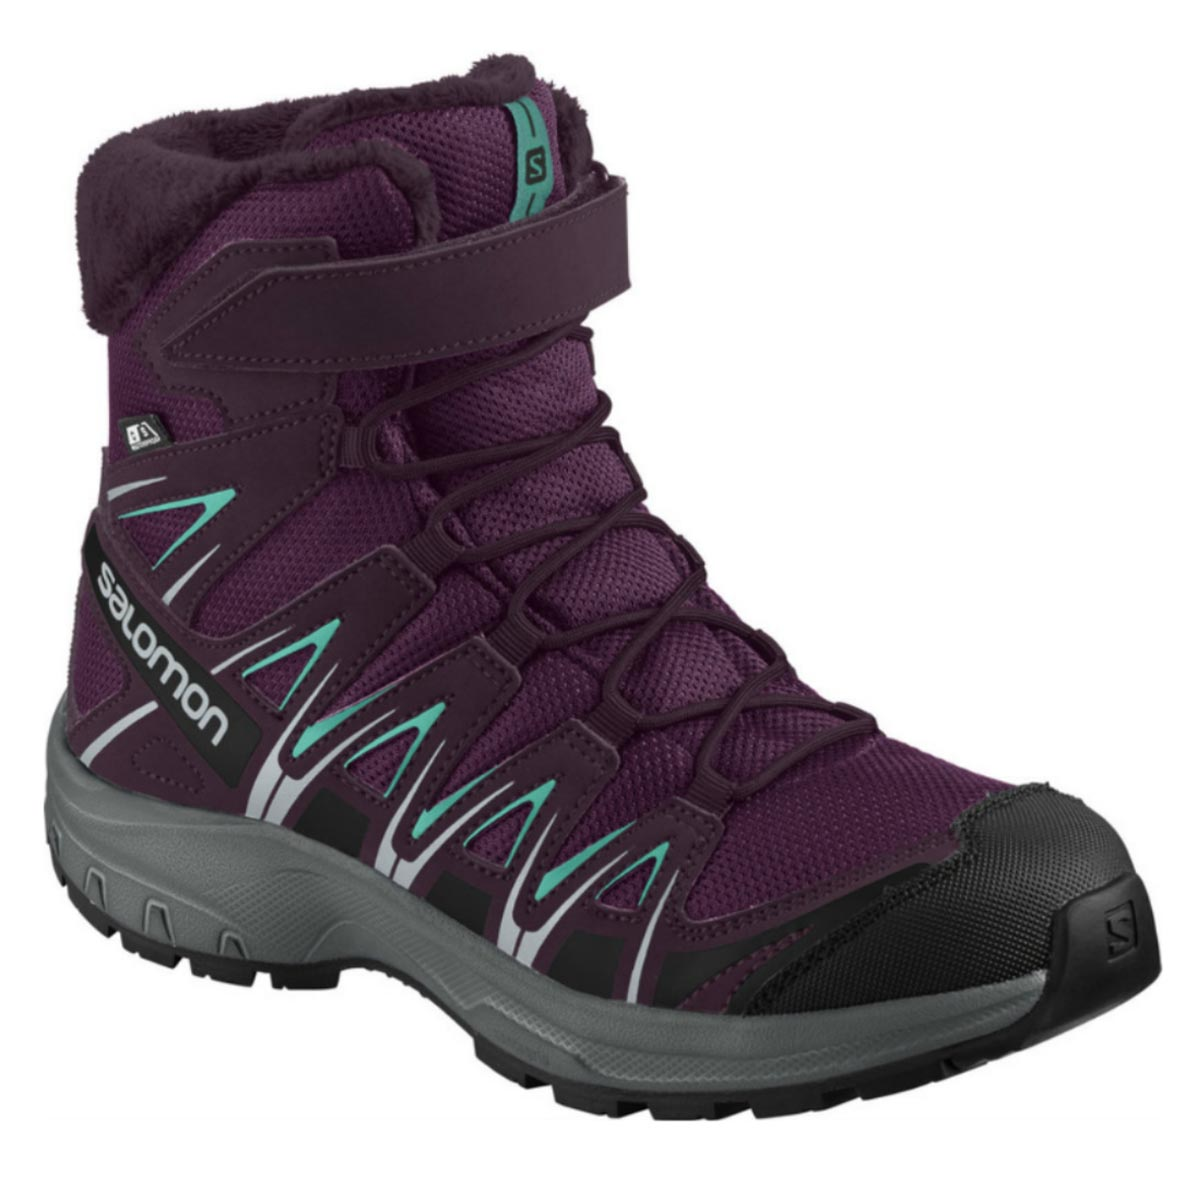 Ботинки утепленные XA PRO 3D WINTER TS CSWP J